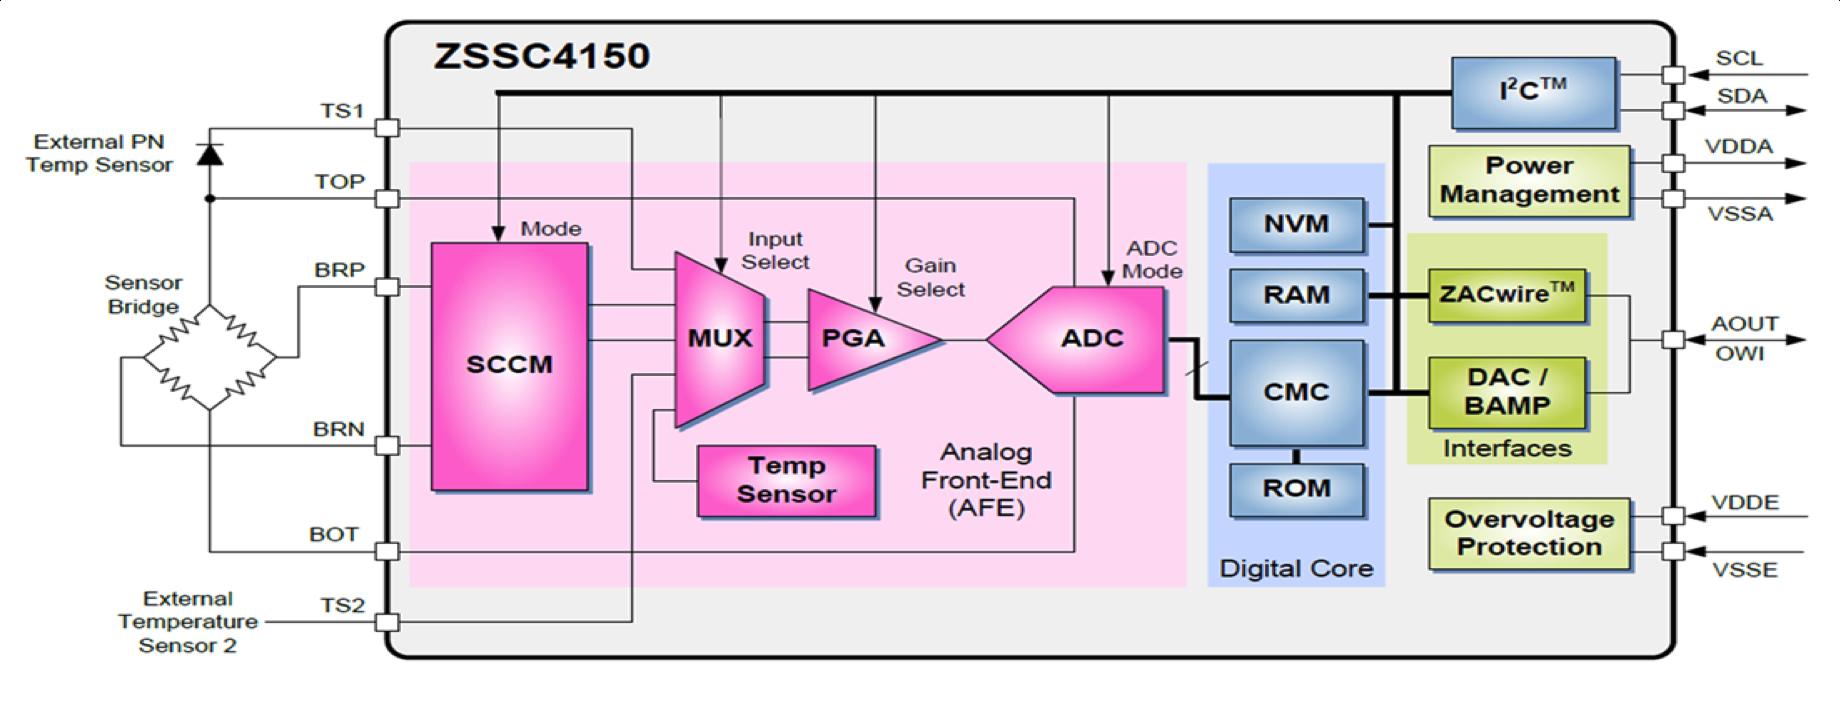 zssc4150-block-diagram